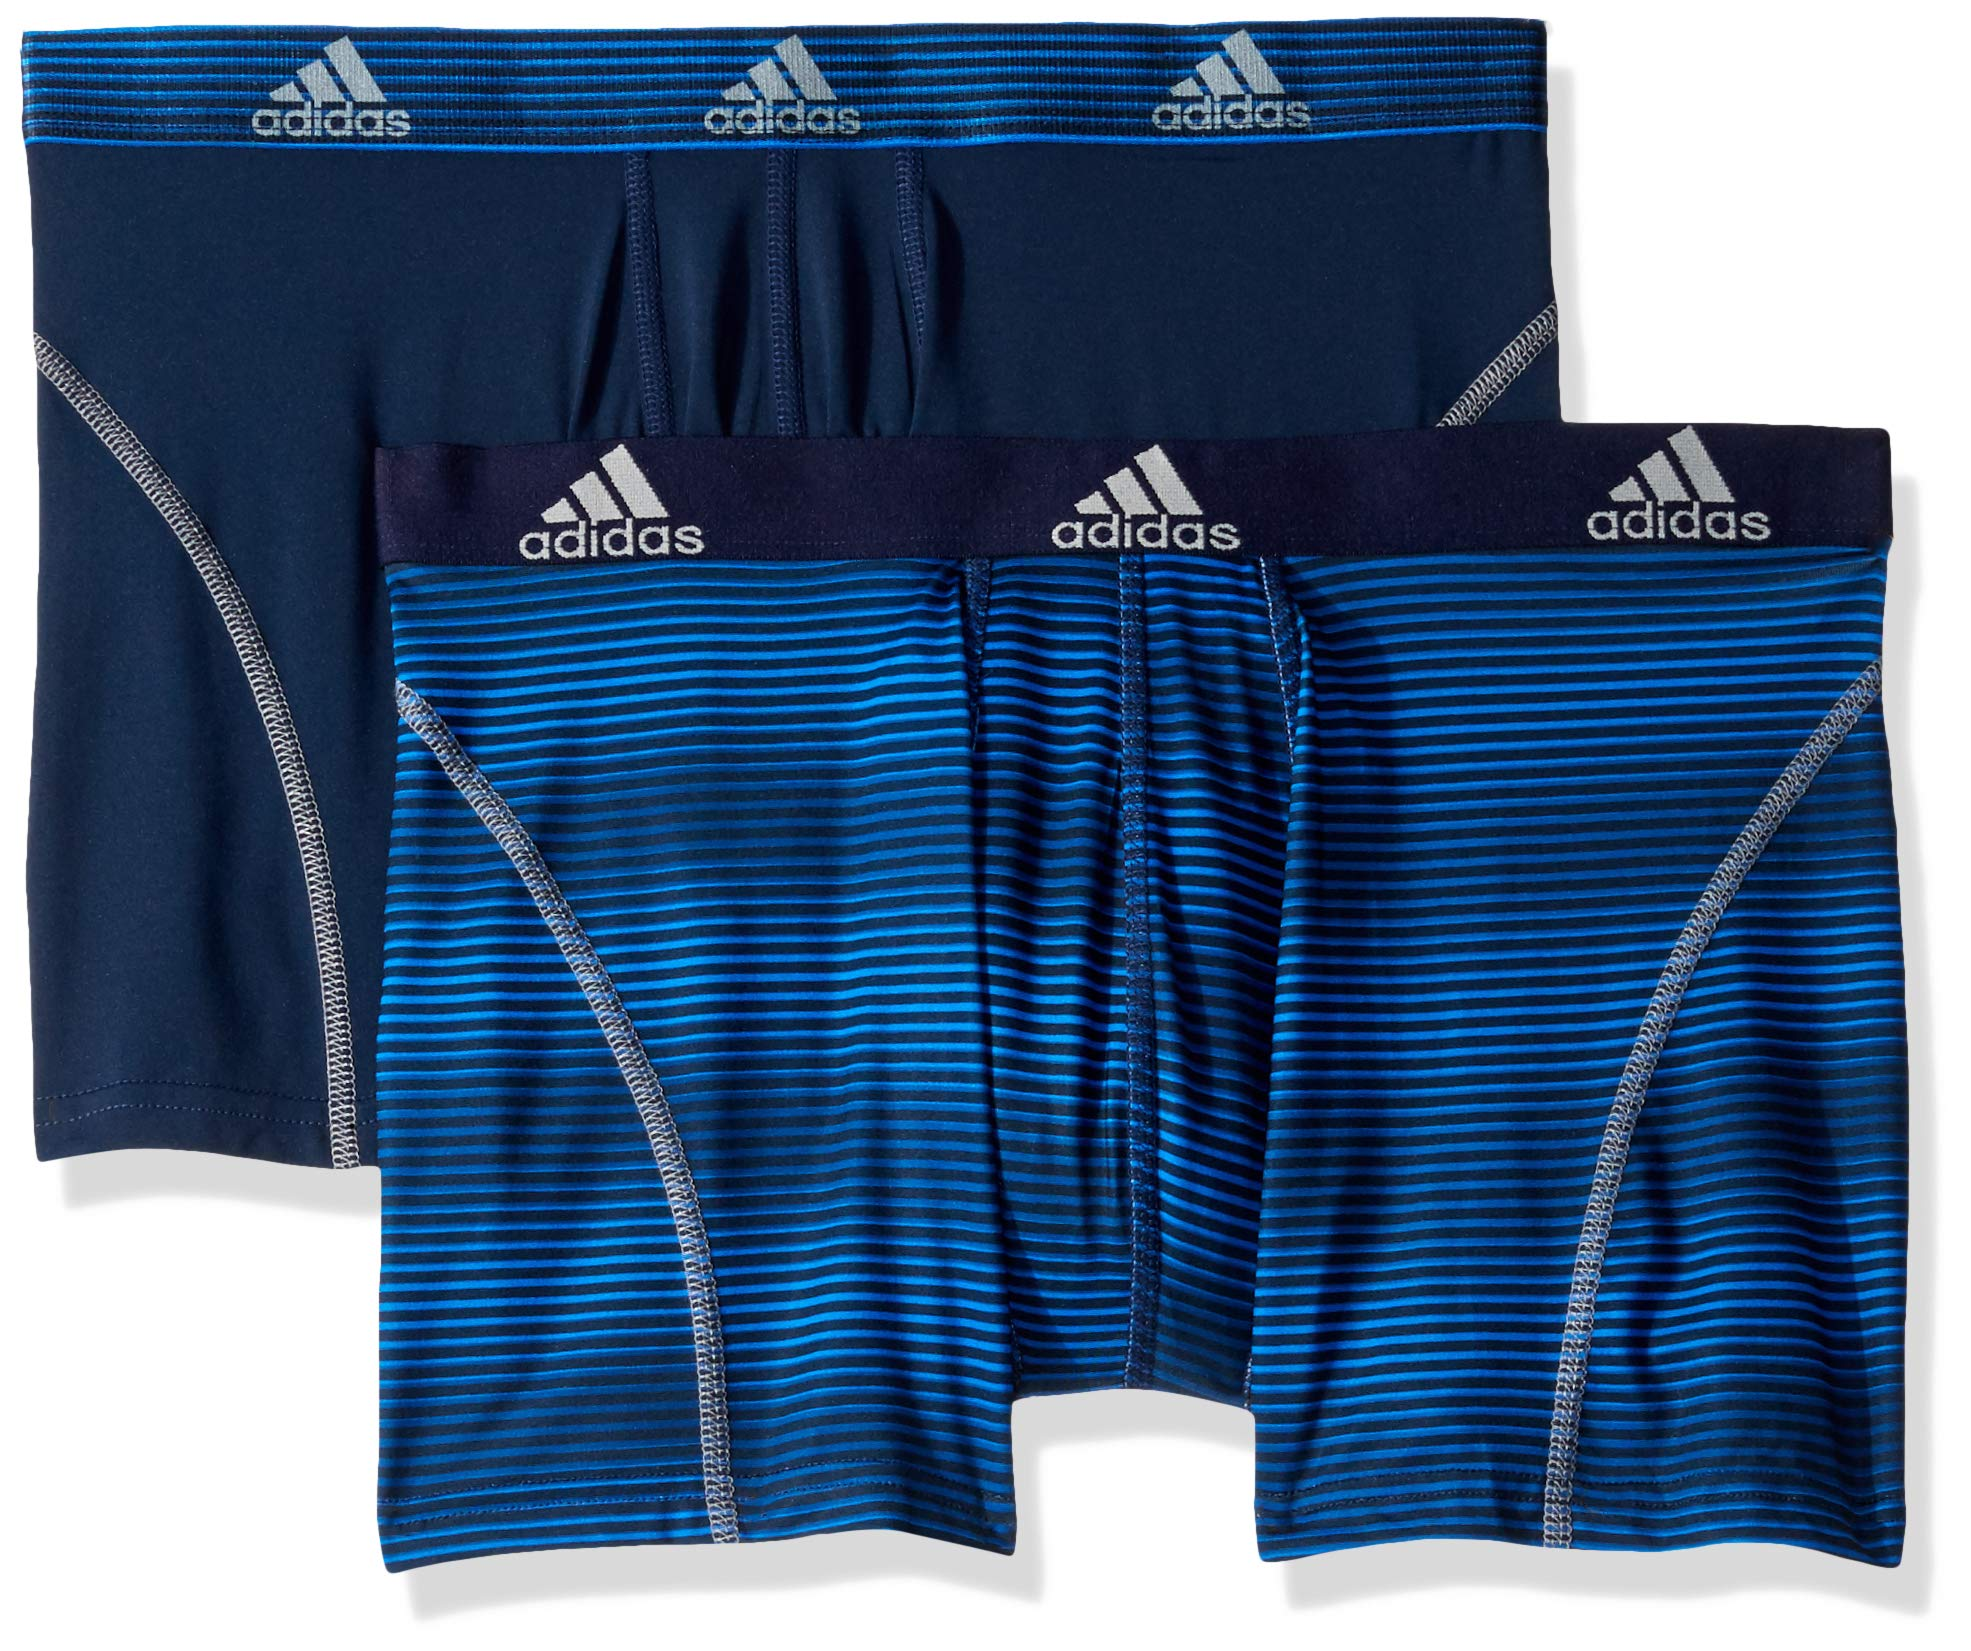 adidas Men's Sport Performance Trunk Underwear (2-Pack), Sundown Collegiate Navy Collegiate Navy/Grey, LARGE by adidas